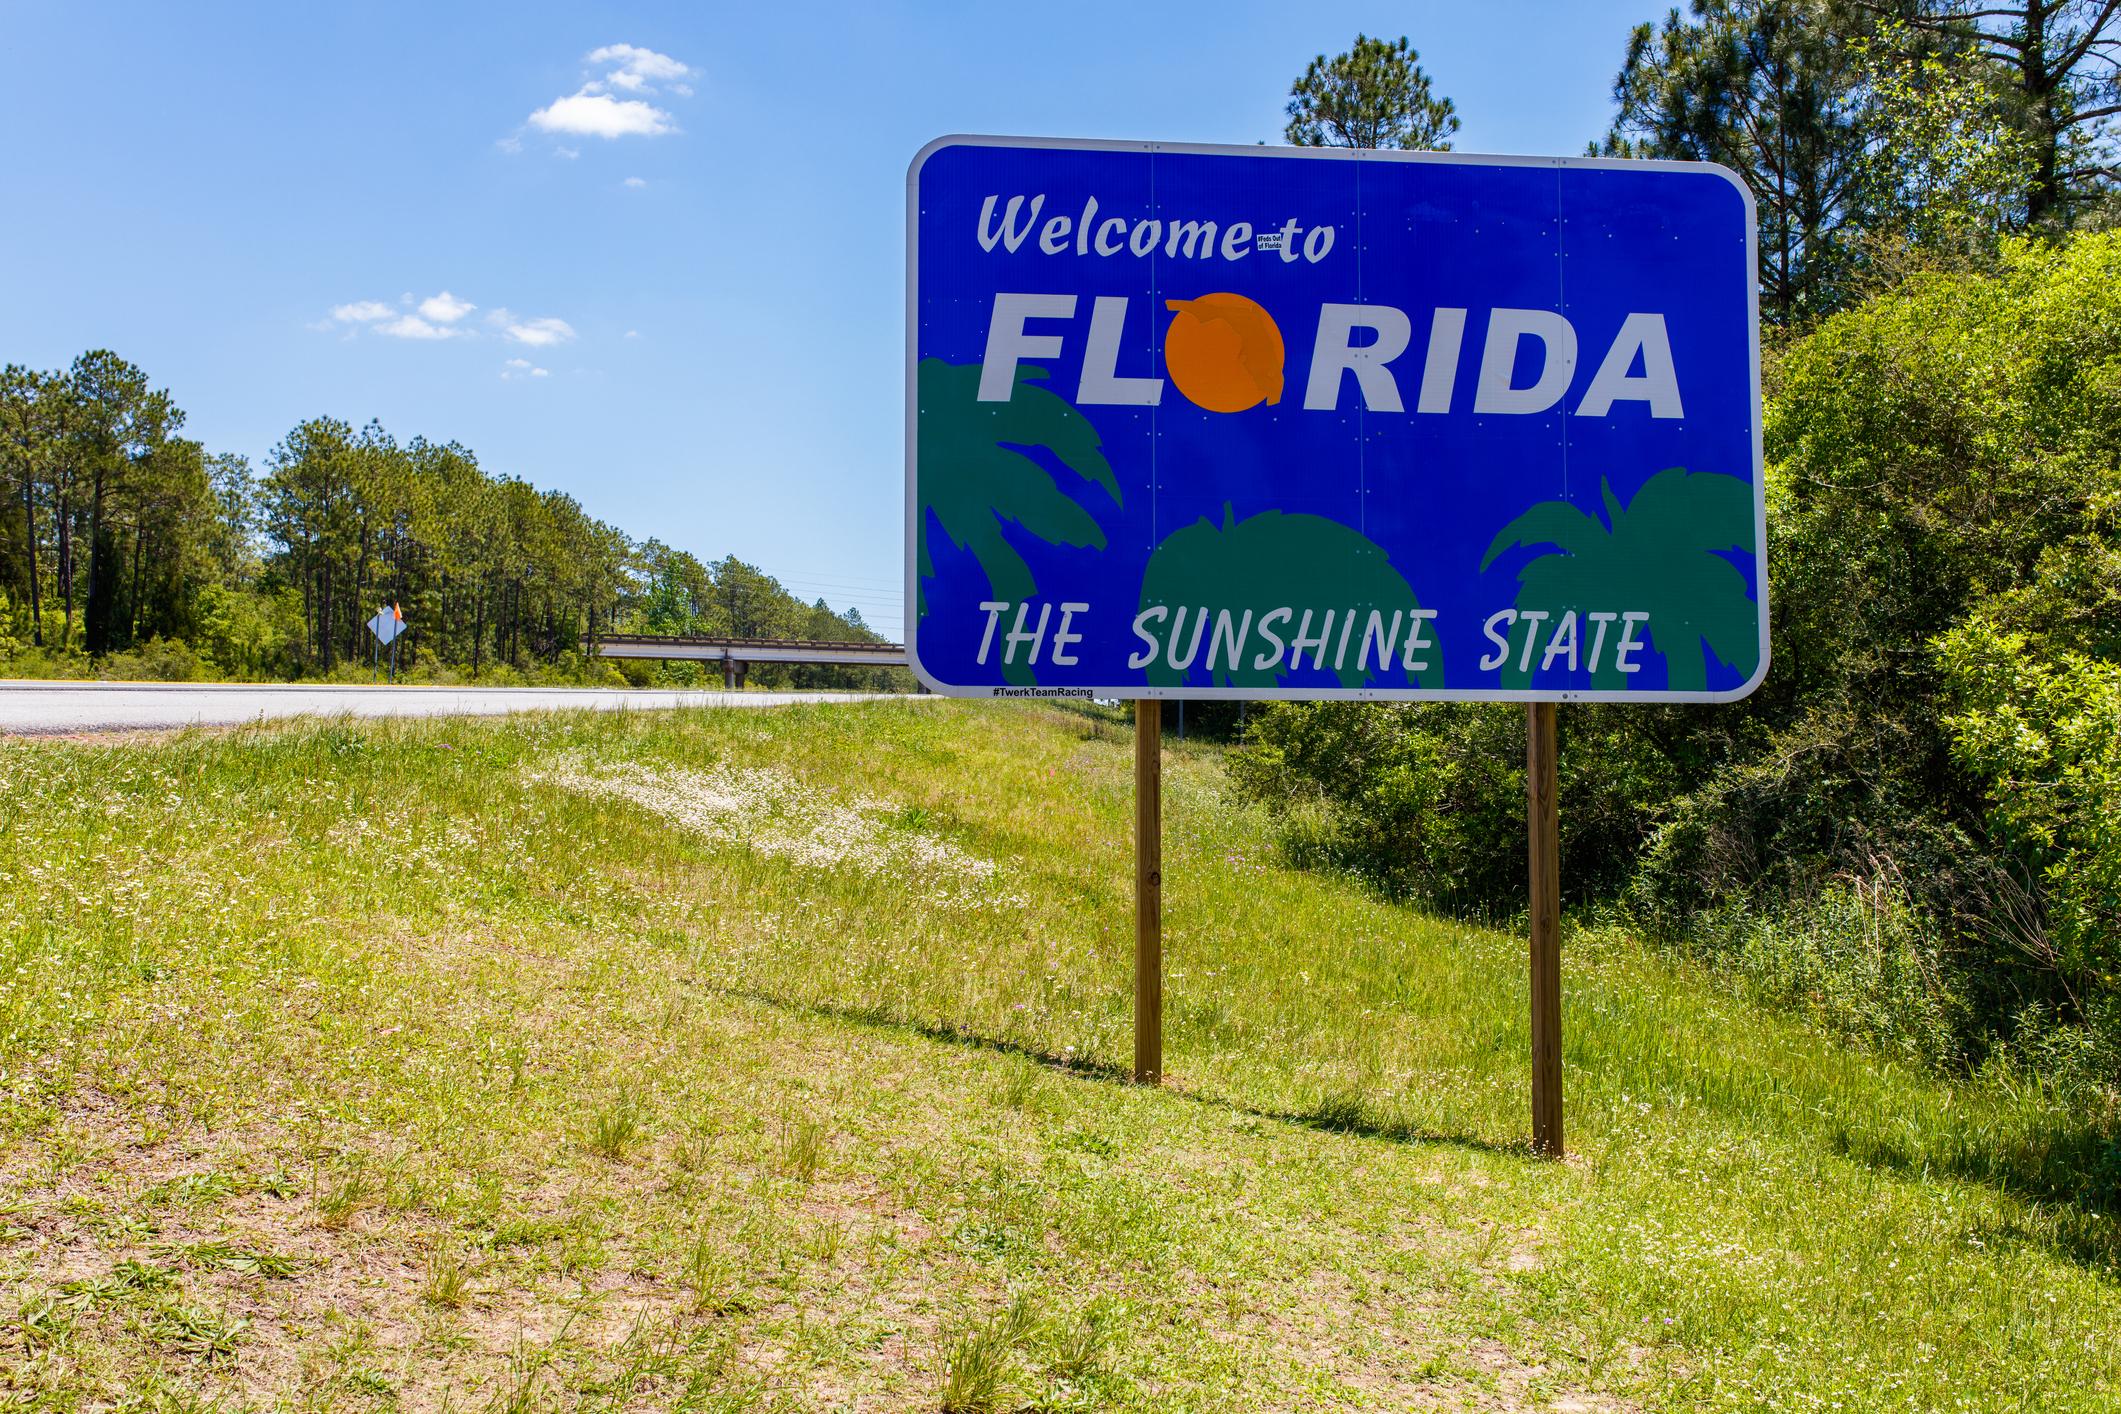 representing moving to florida